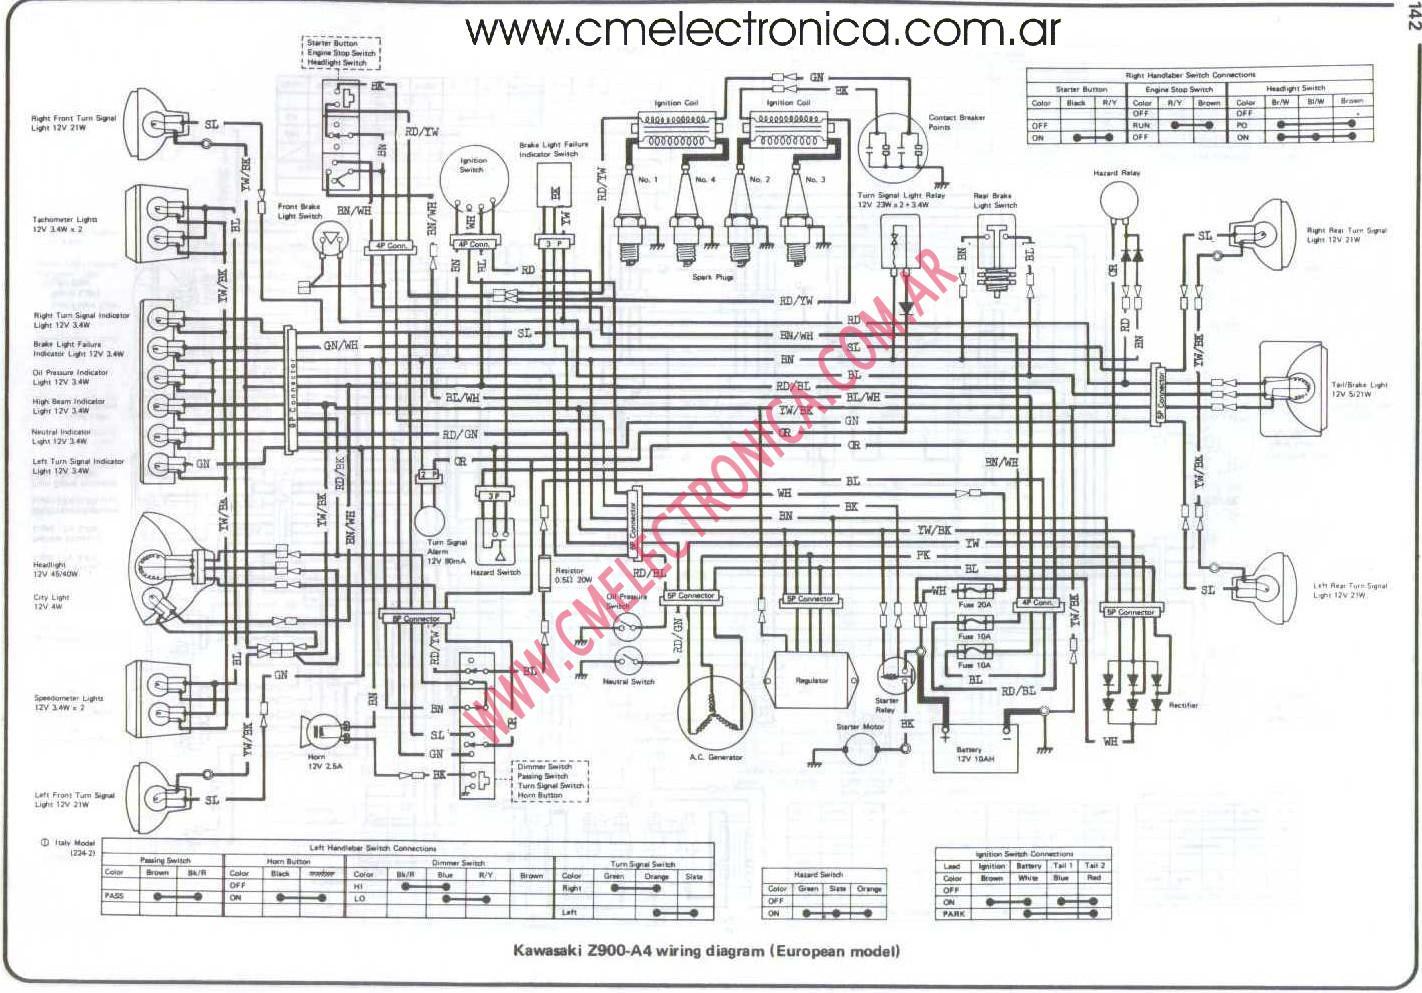 hight resolution of kawasaki z900 a4 kawasaki teryx 750 engine diagram kawasaki vulcan 750 engine kawasaki vulcan 800 wiring